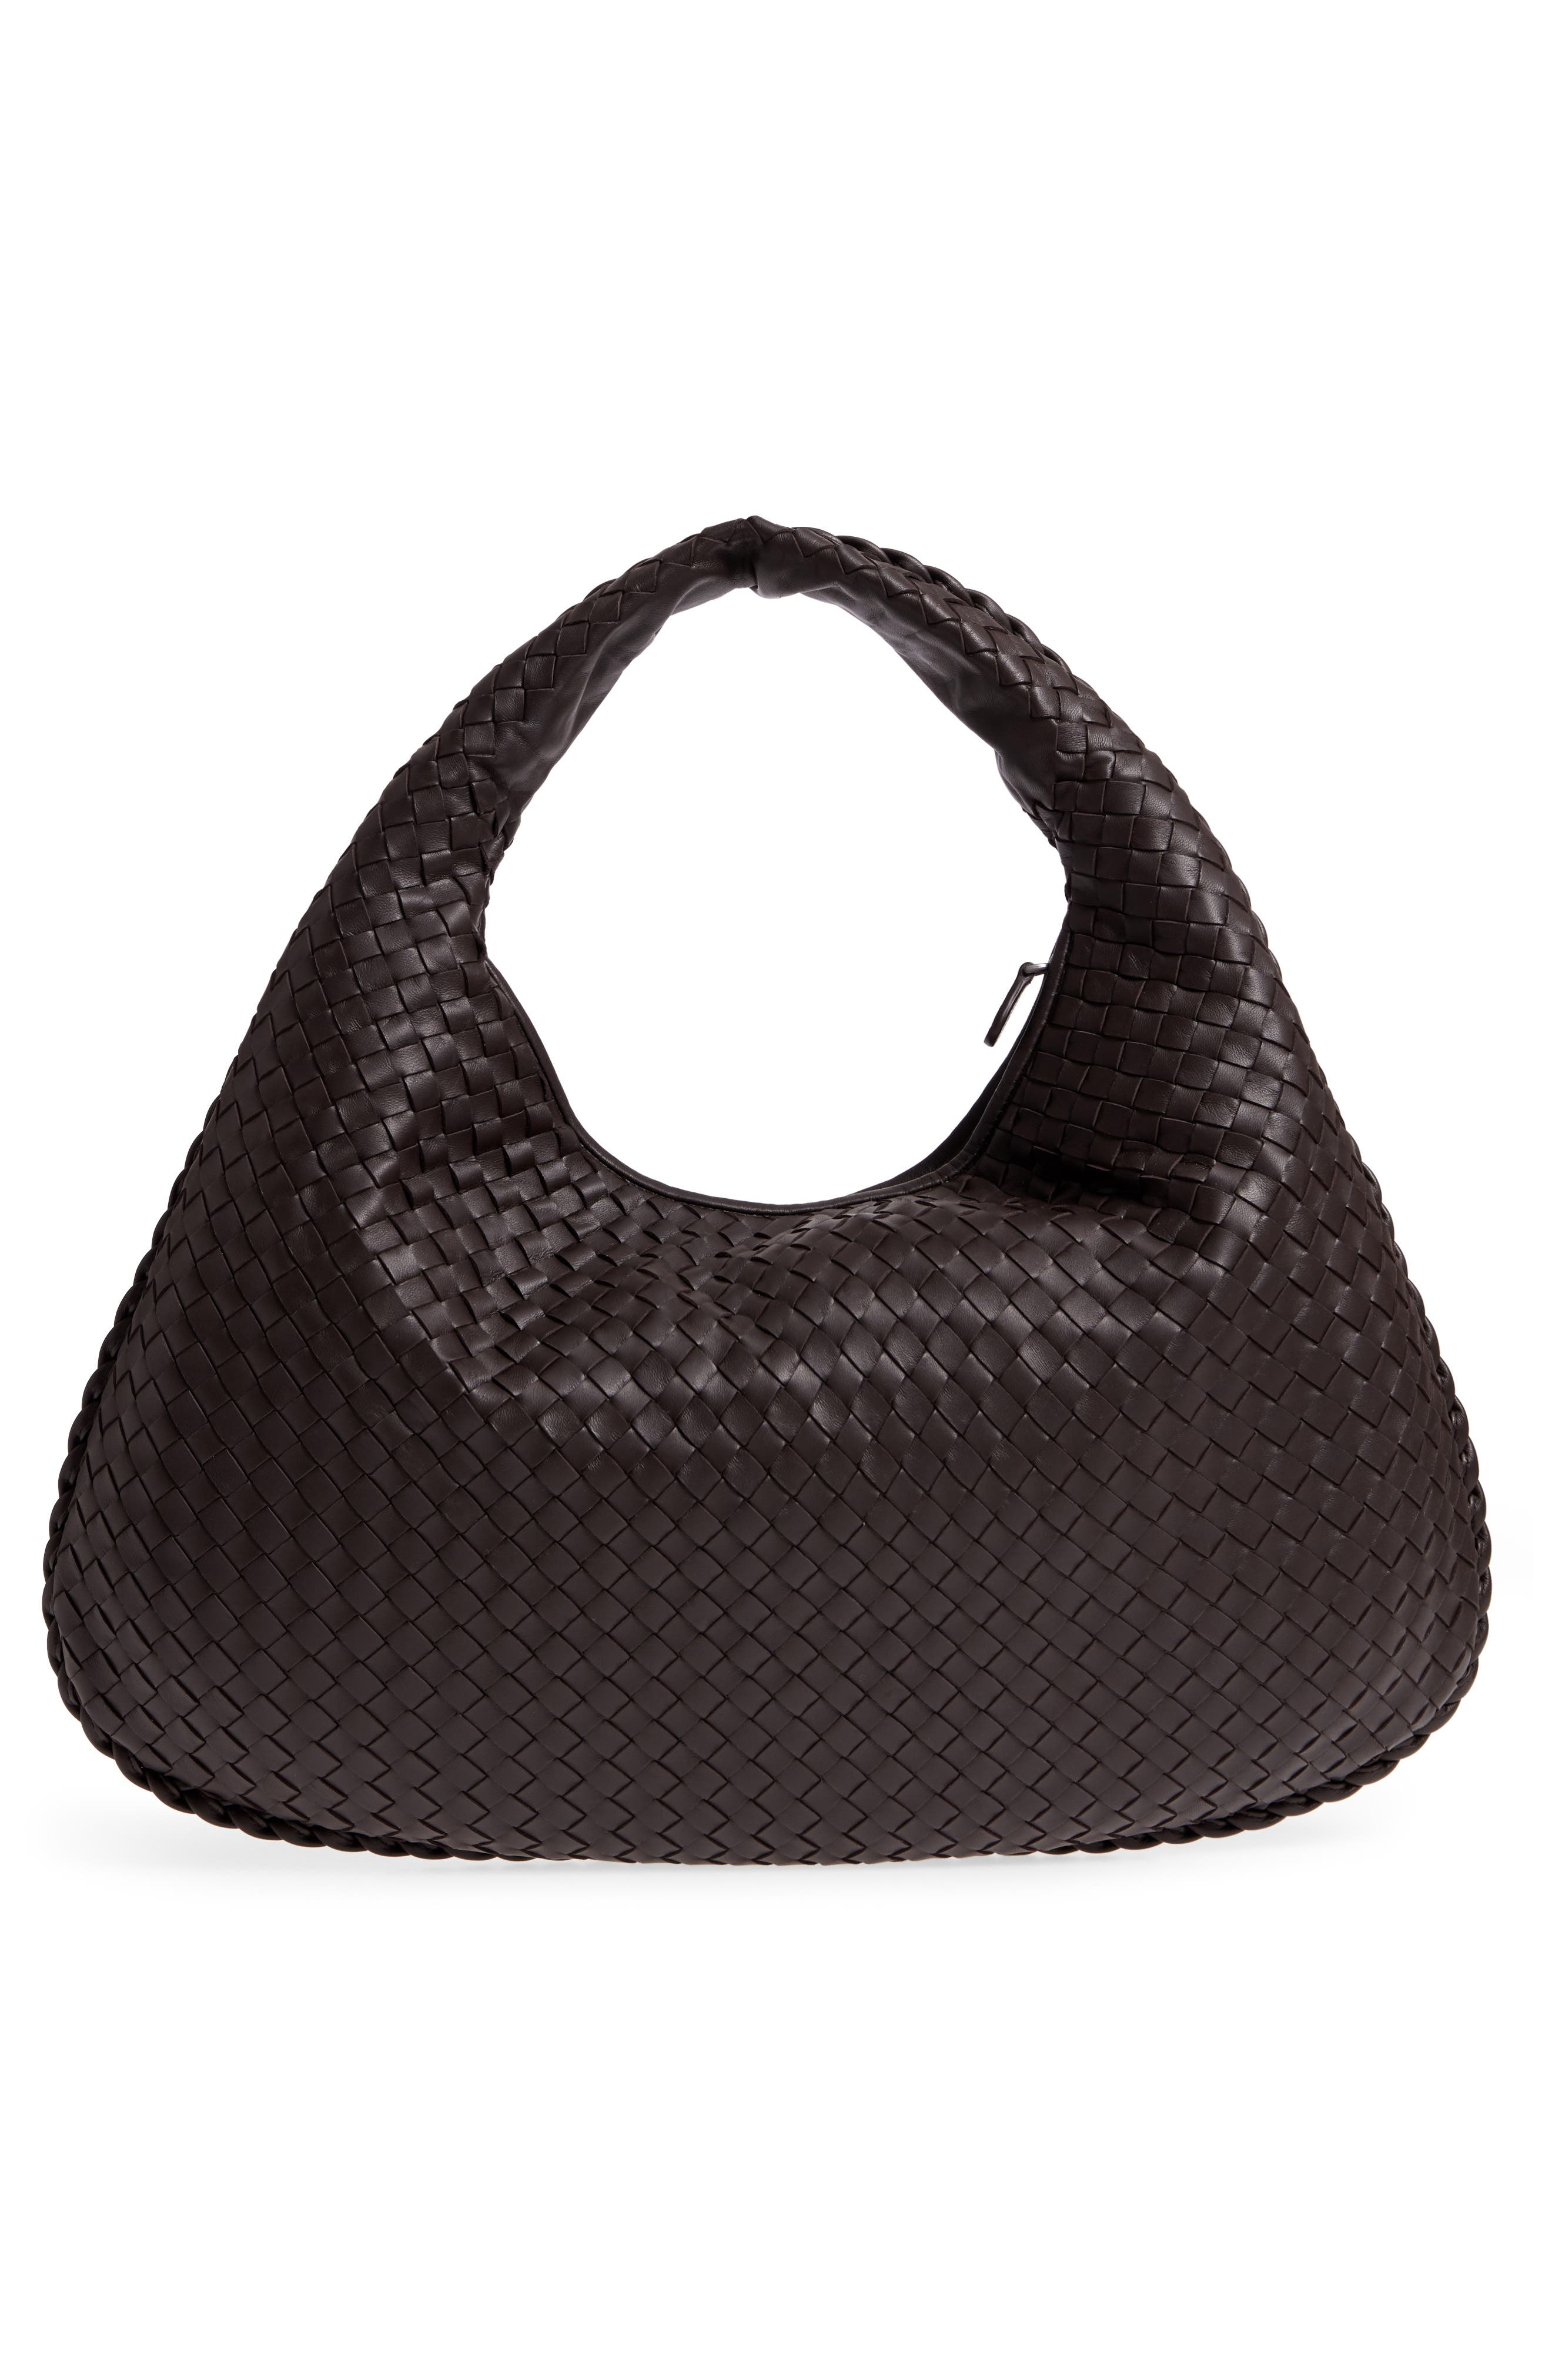 Large Veneta Leather Hobo,                             Alternate thumbnail 3, color,                             2074 Espresso